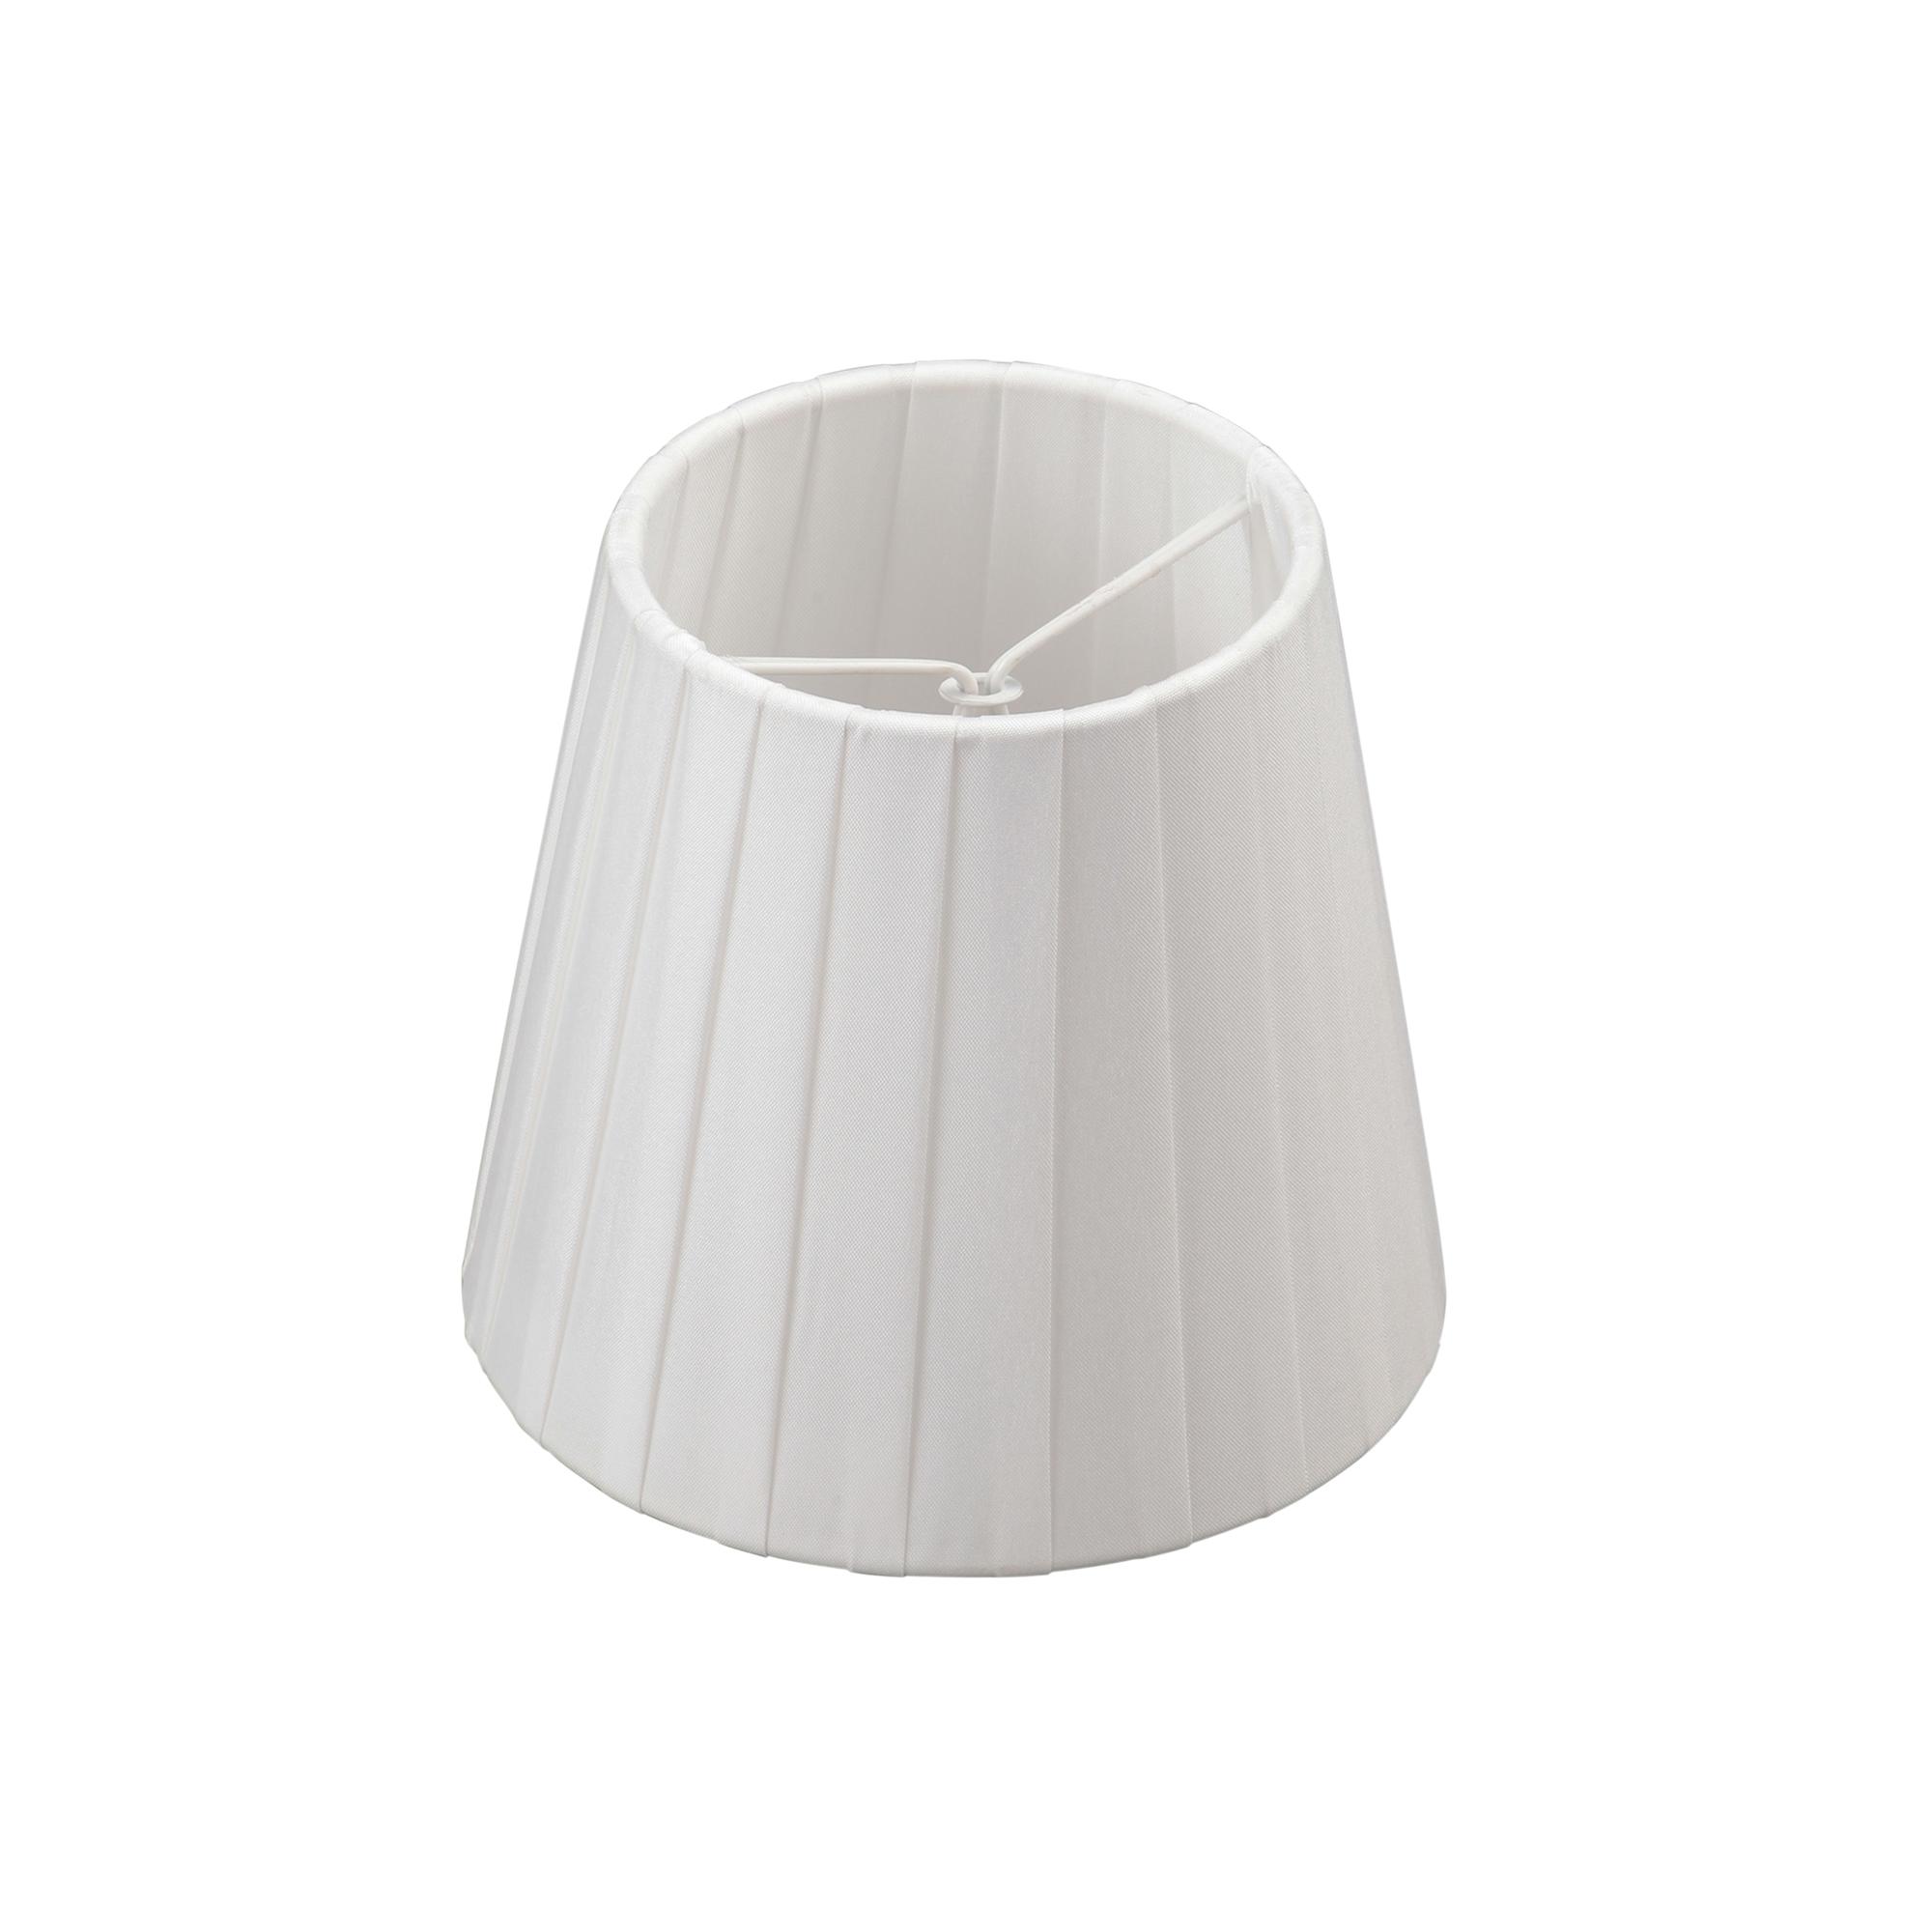 Абажур белый, е14, h=110mm, d120xd90 mm, прищепка Vitaluce